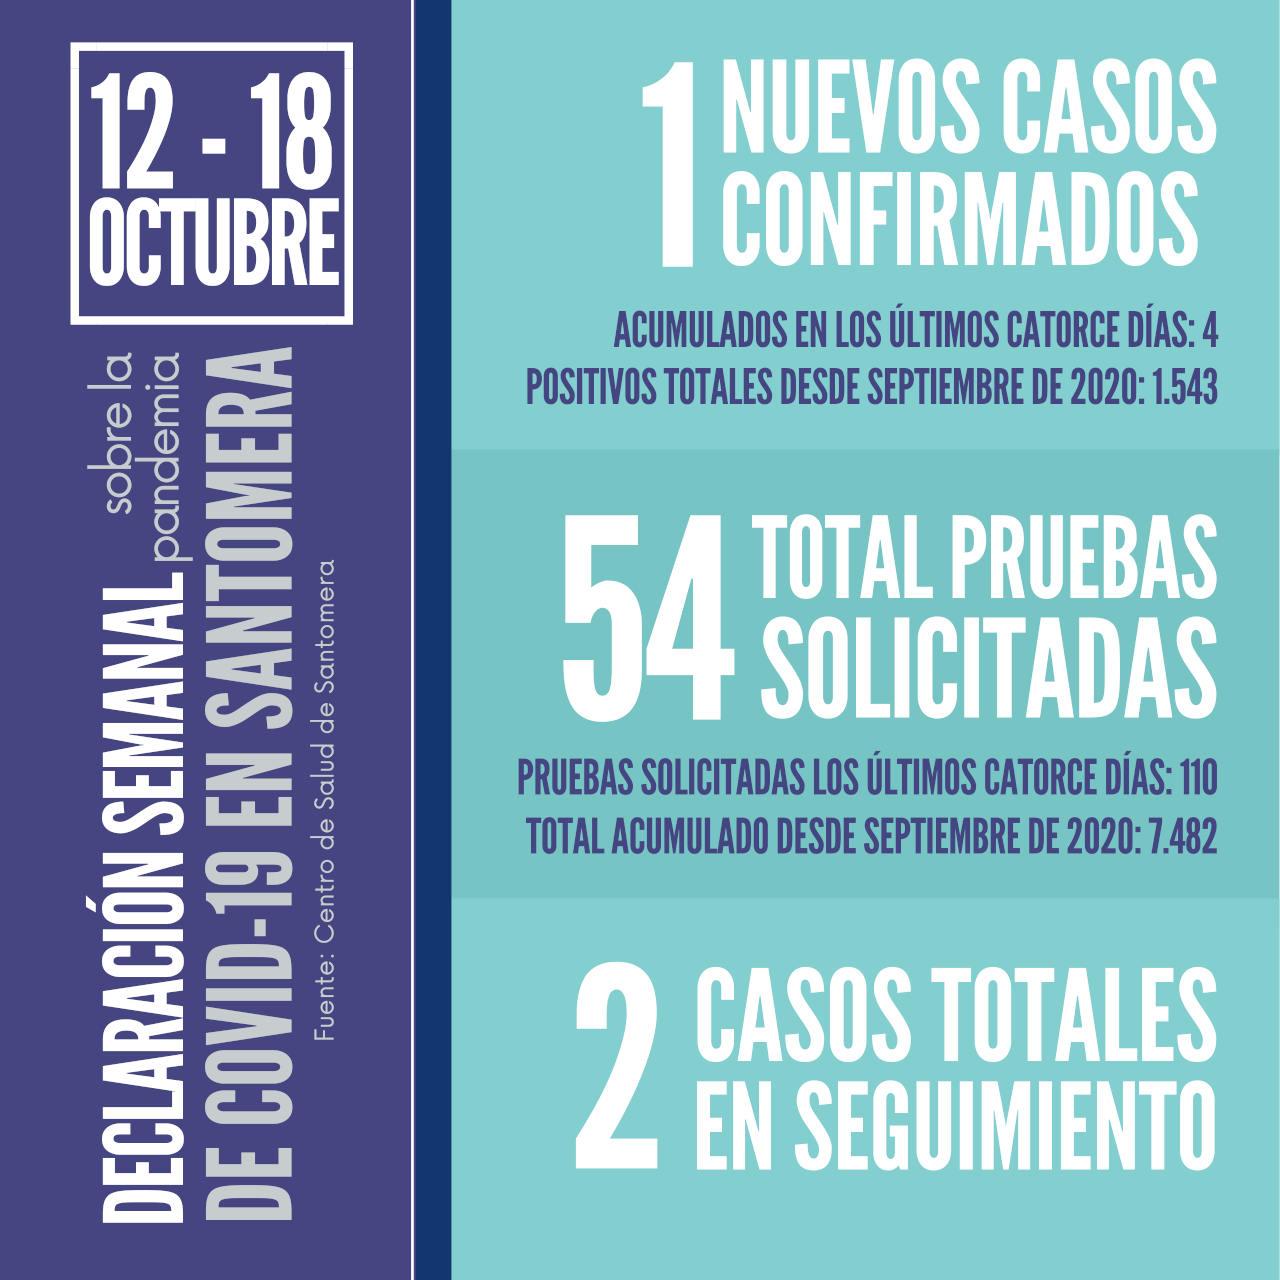 20211018_Datos COVID Santomera